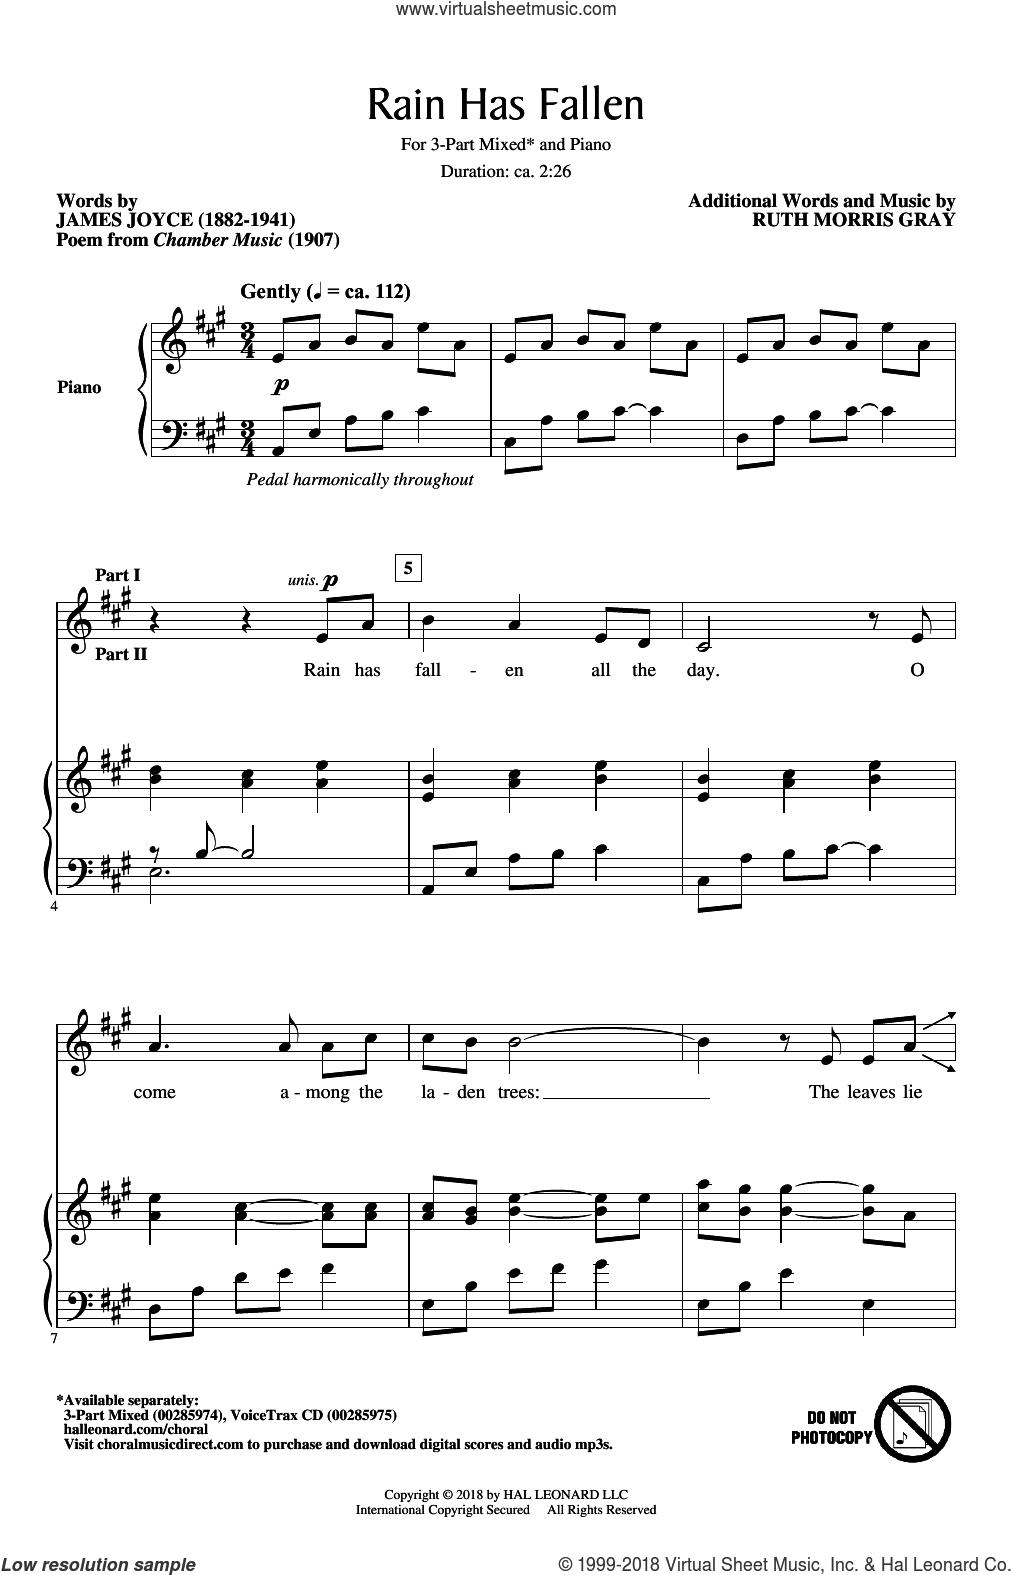 Rain Has Fallen sheet music for choir (3-Part Mixed) by Ruth Morris Gray and James Joyce, intermediate skill level